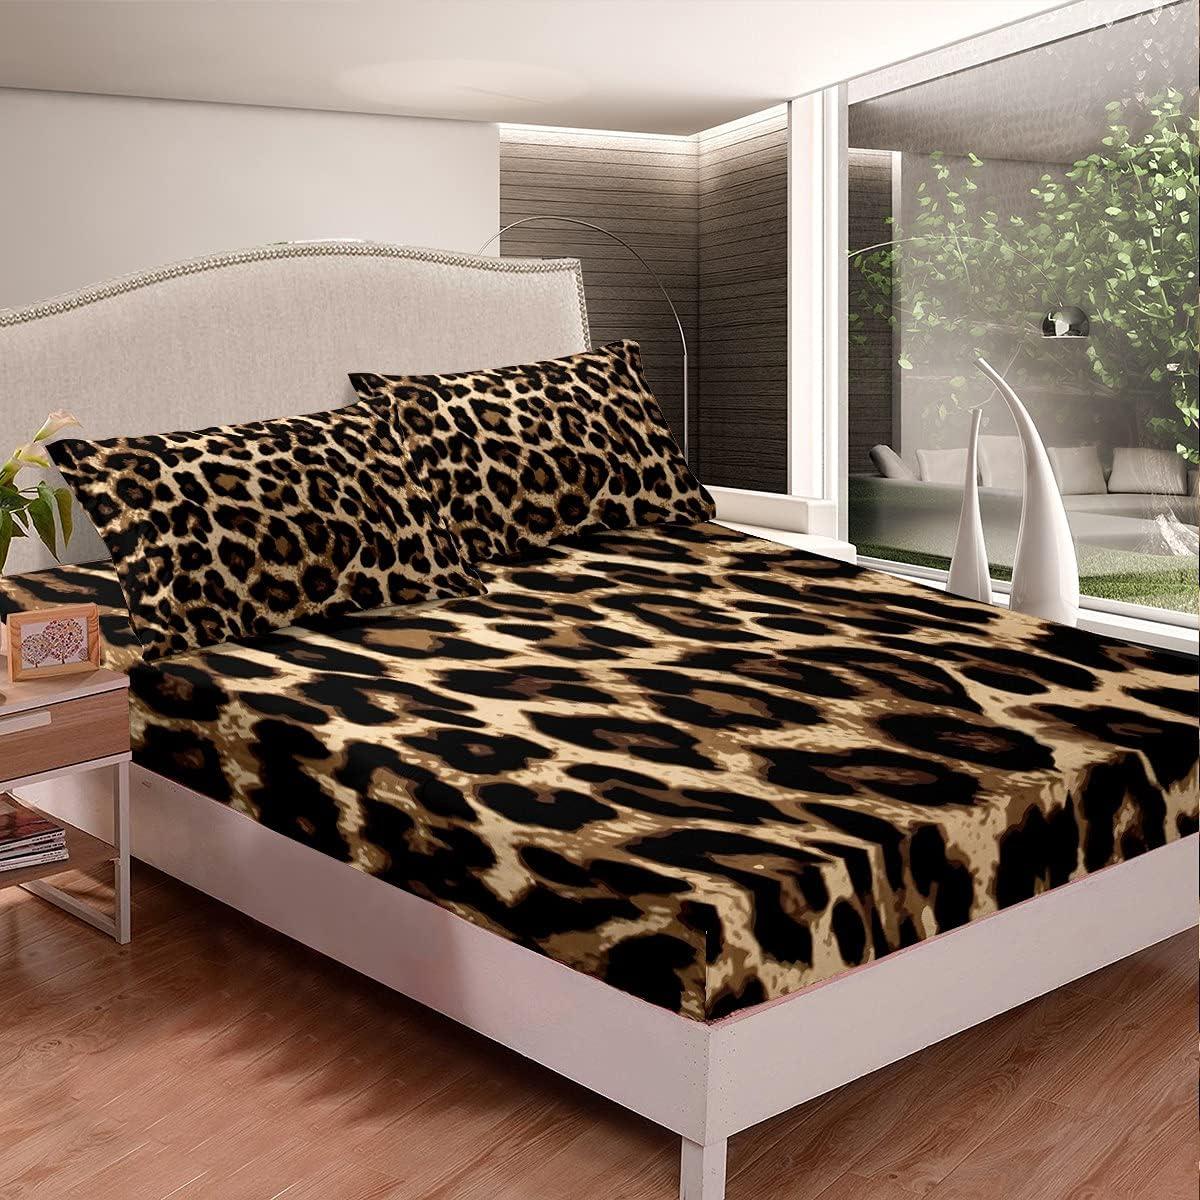 Erosebridal Leopard Print Fitted Sheet Leo Full Max 70% OFF Challenge the lowest price of Japan ☆ Size Brown Black